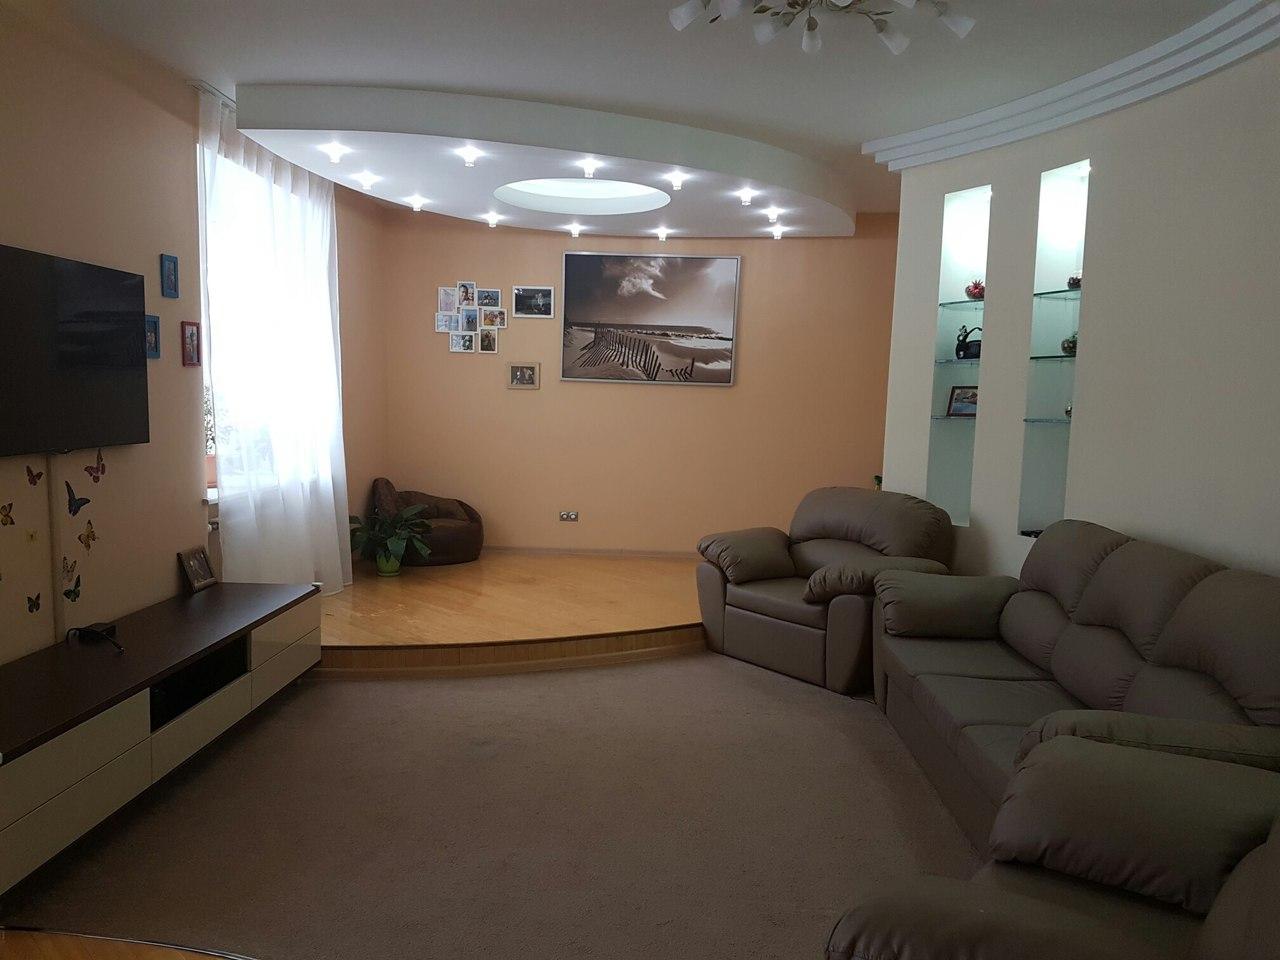 Комната зал после ремонта фото